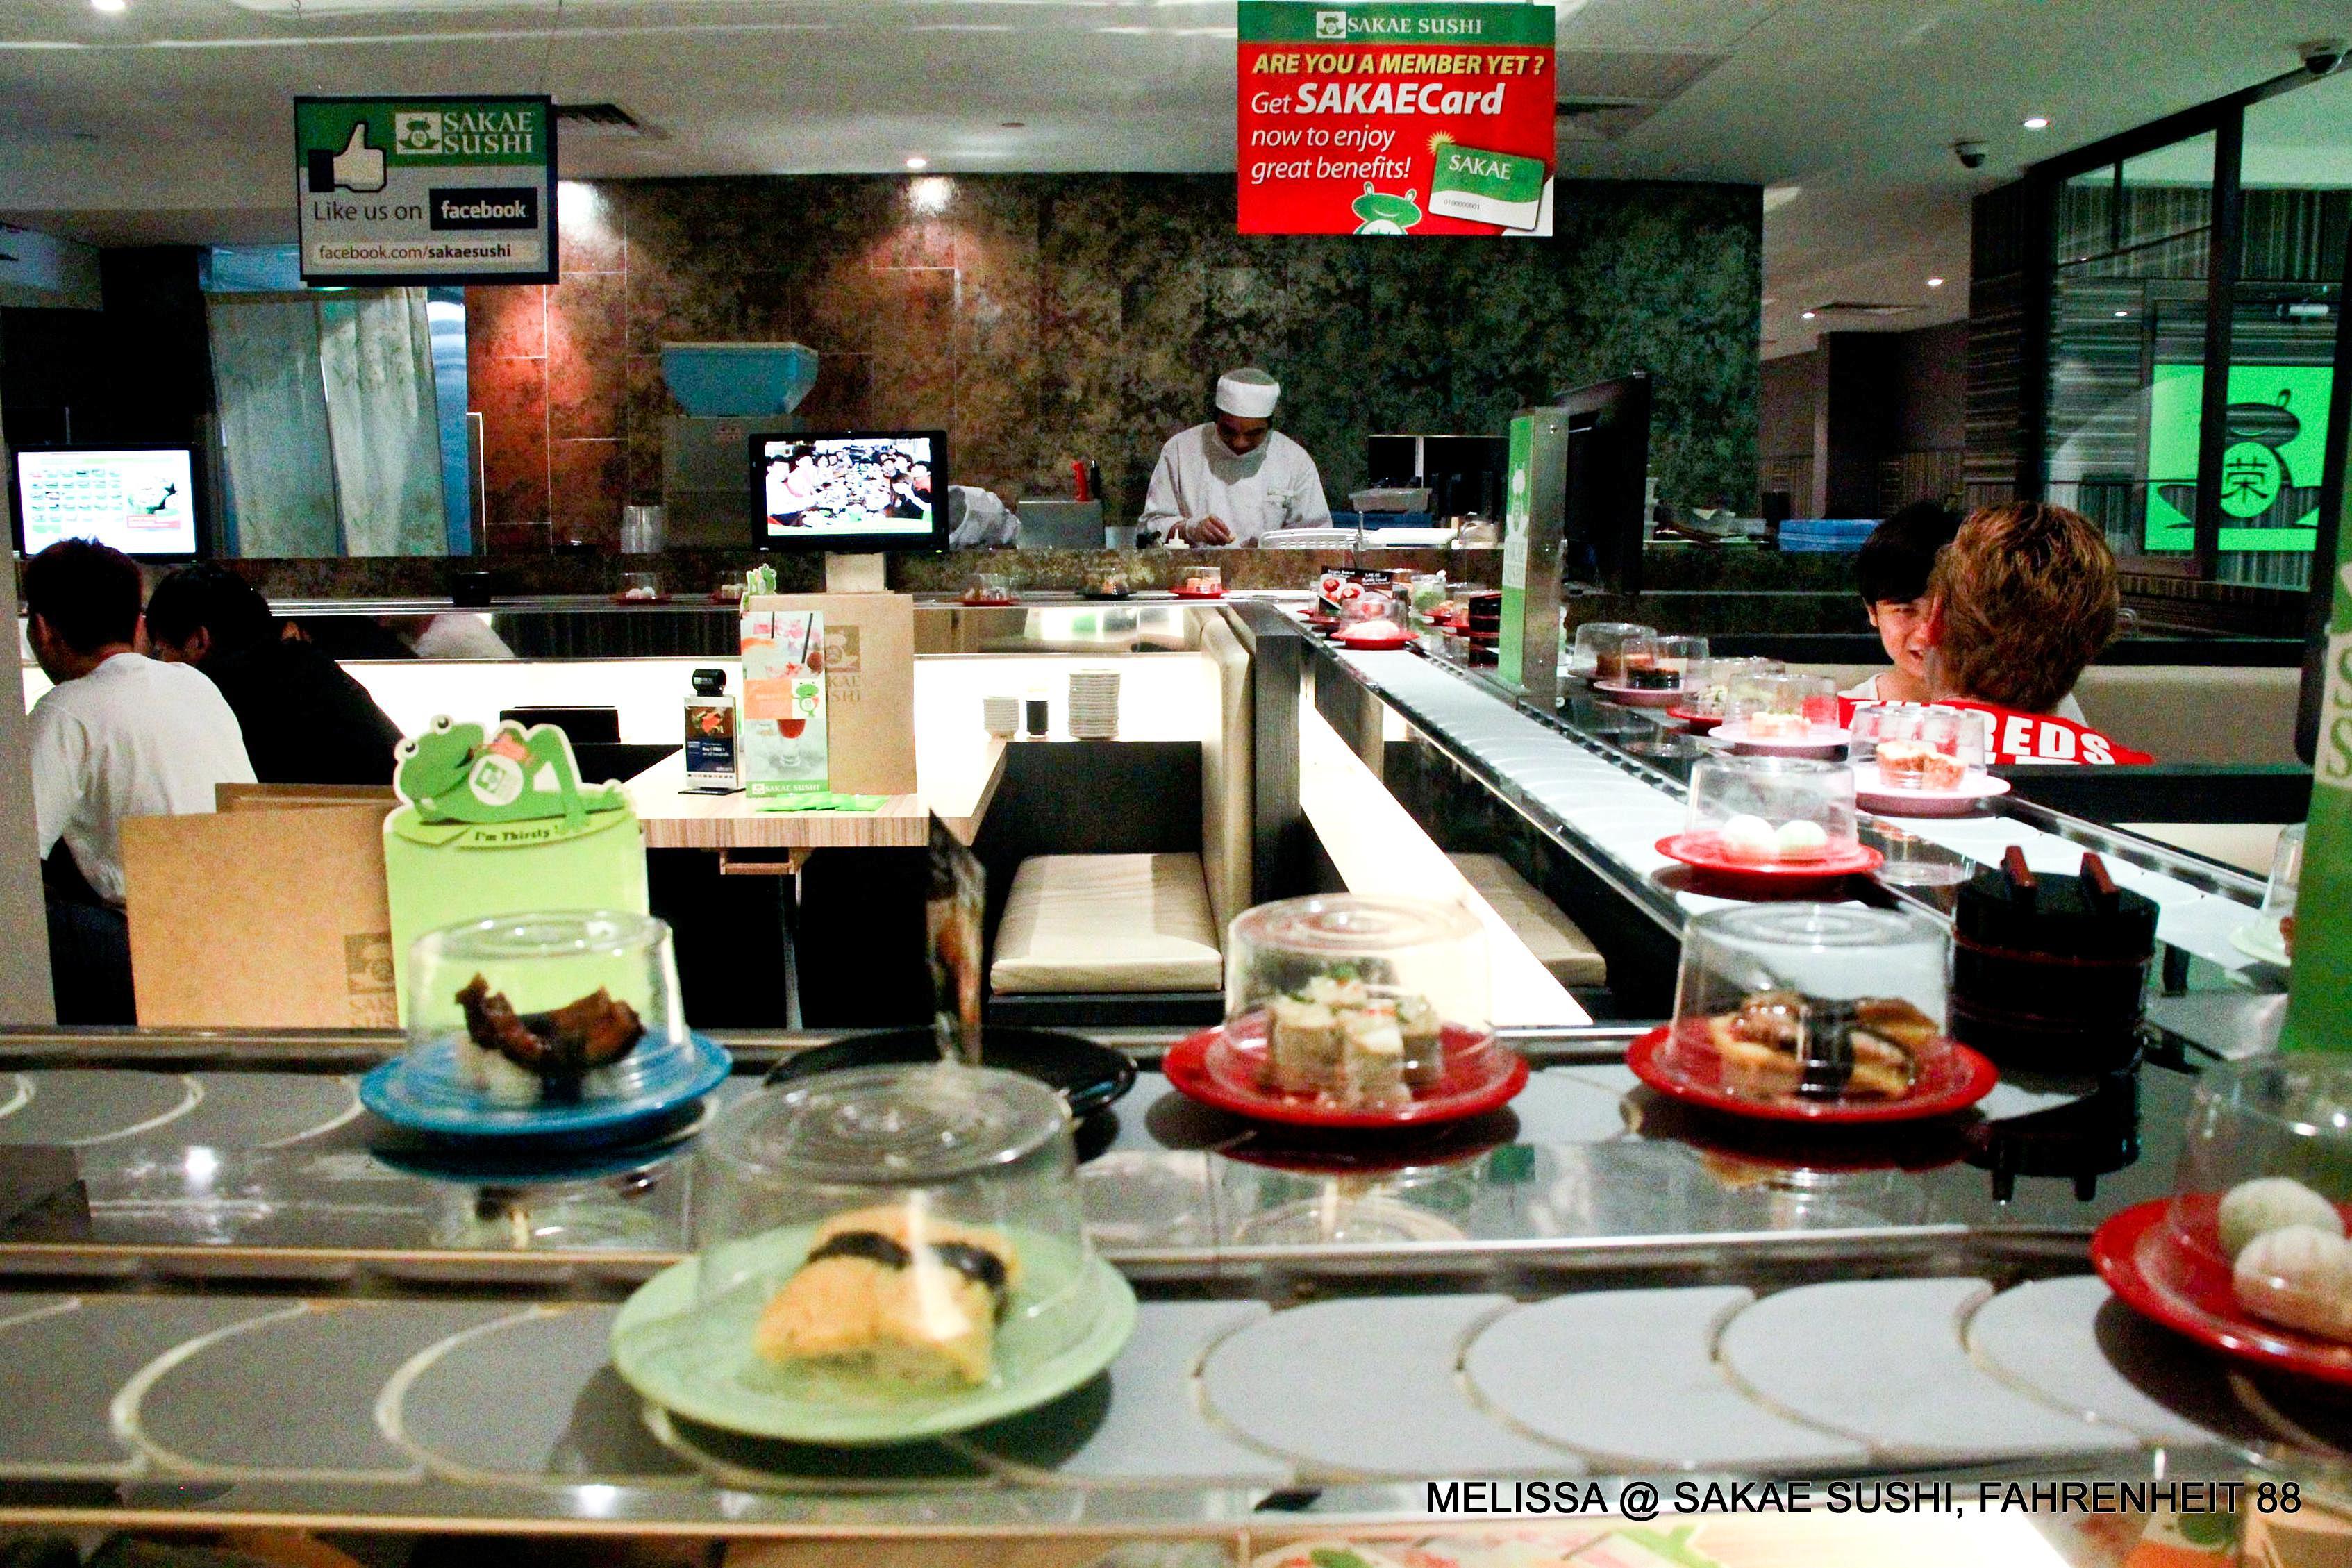 Dinner Sakae Sushi Fahrenheit88 Kl This Is Me Melissa S Blog